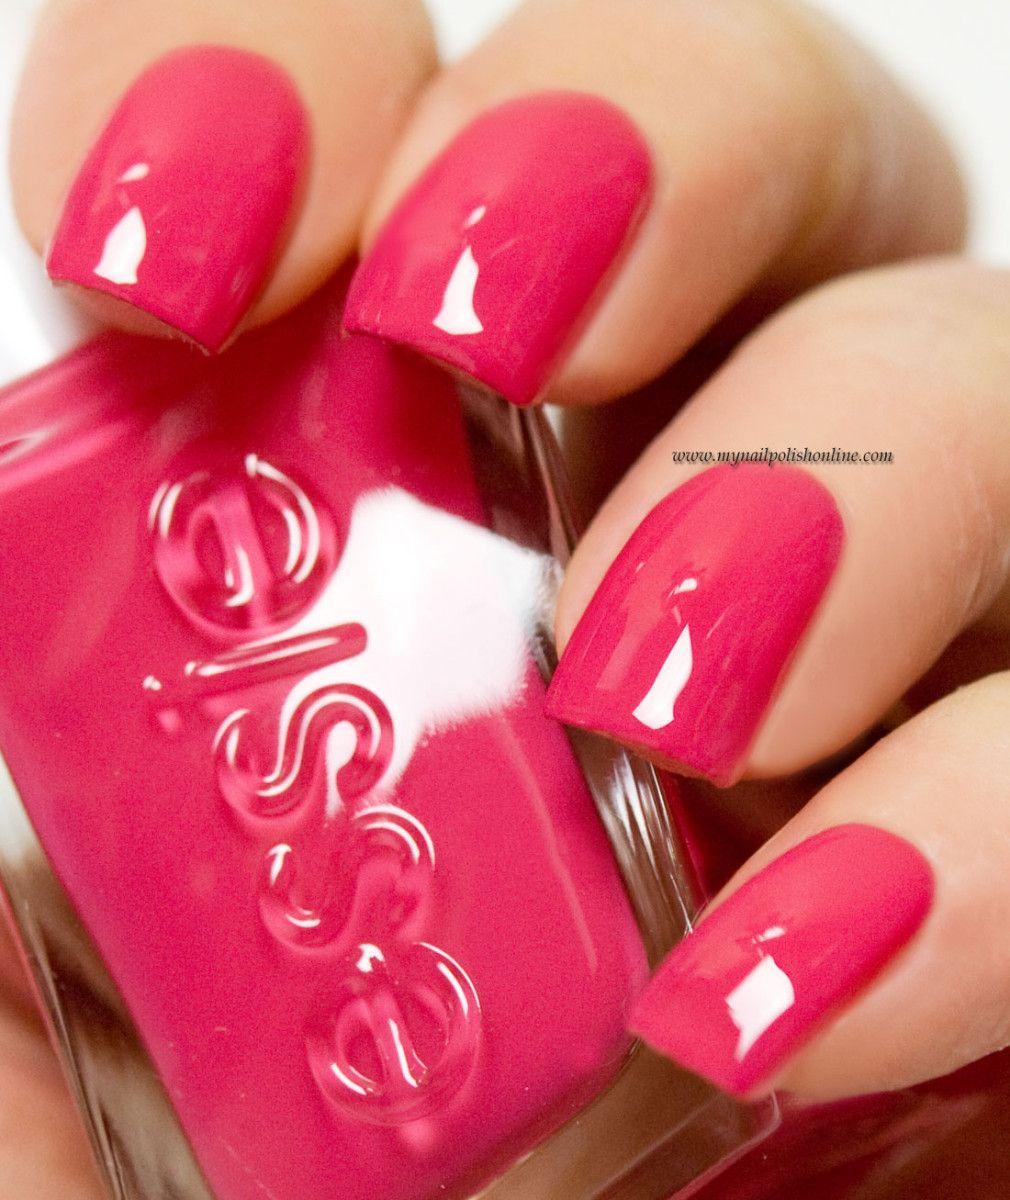 Essie - The It-factor | vernis | Nail polish online, Nails, Nail polish